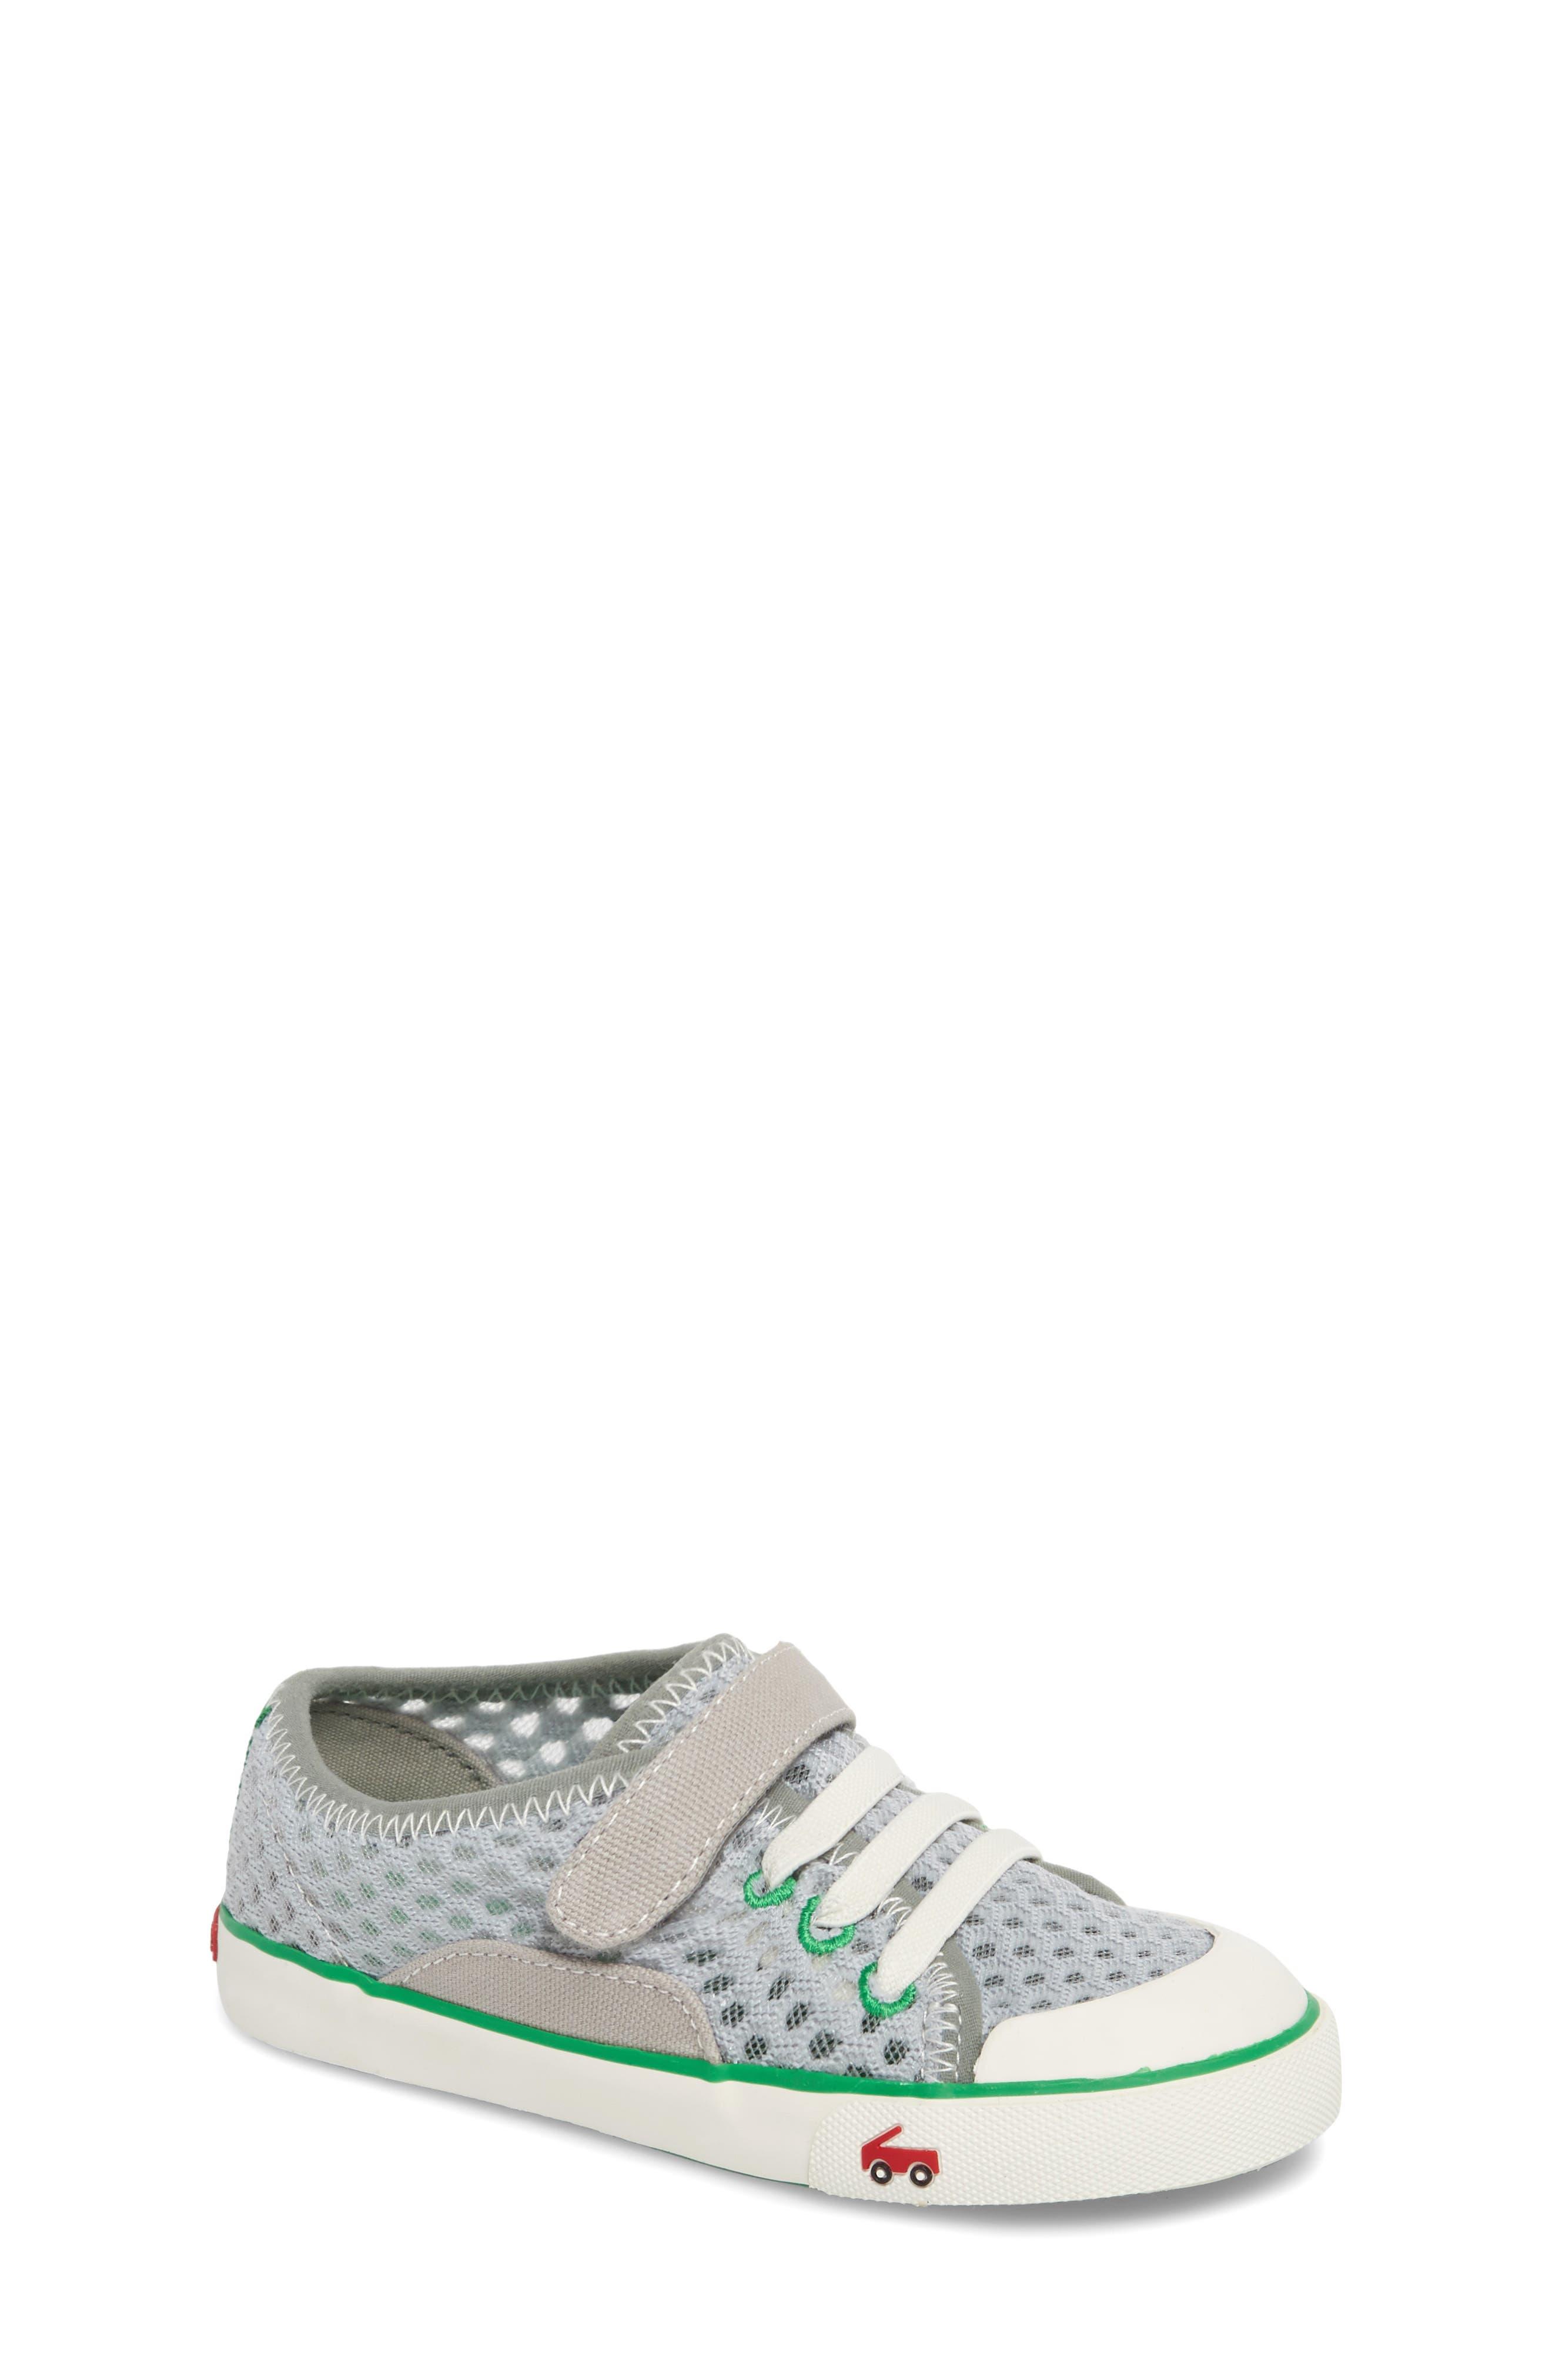 Saylor Sneaker,                             Main thumbnail 1, color,                             020